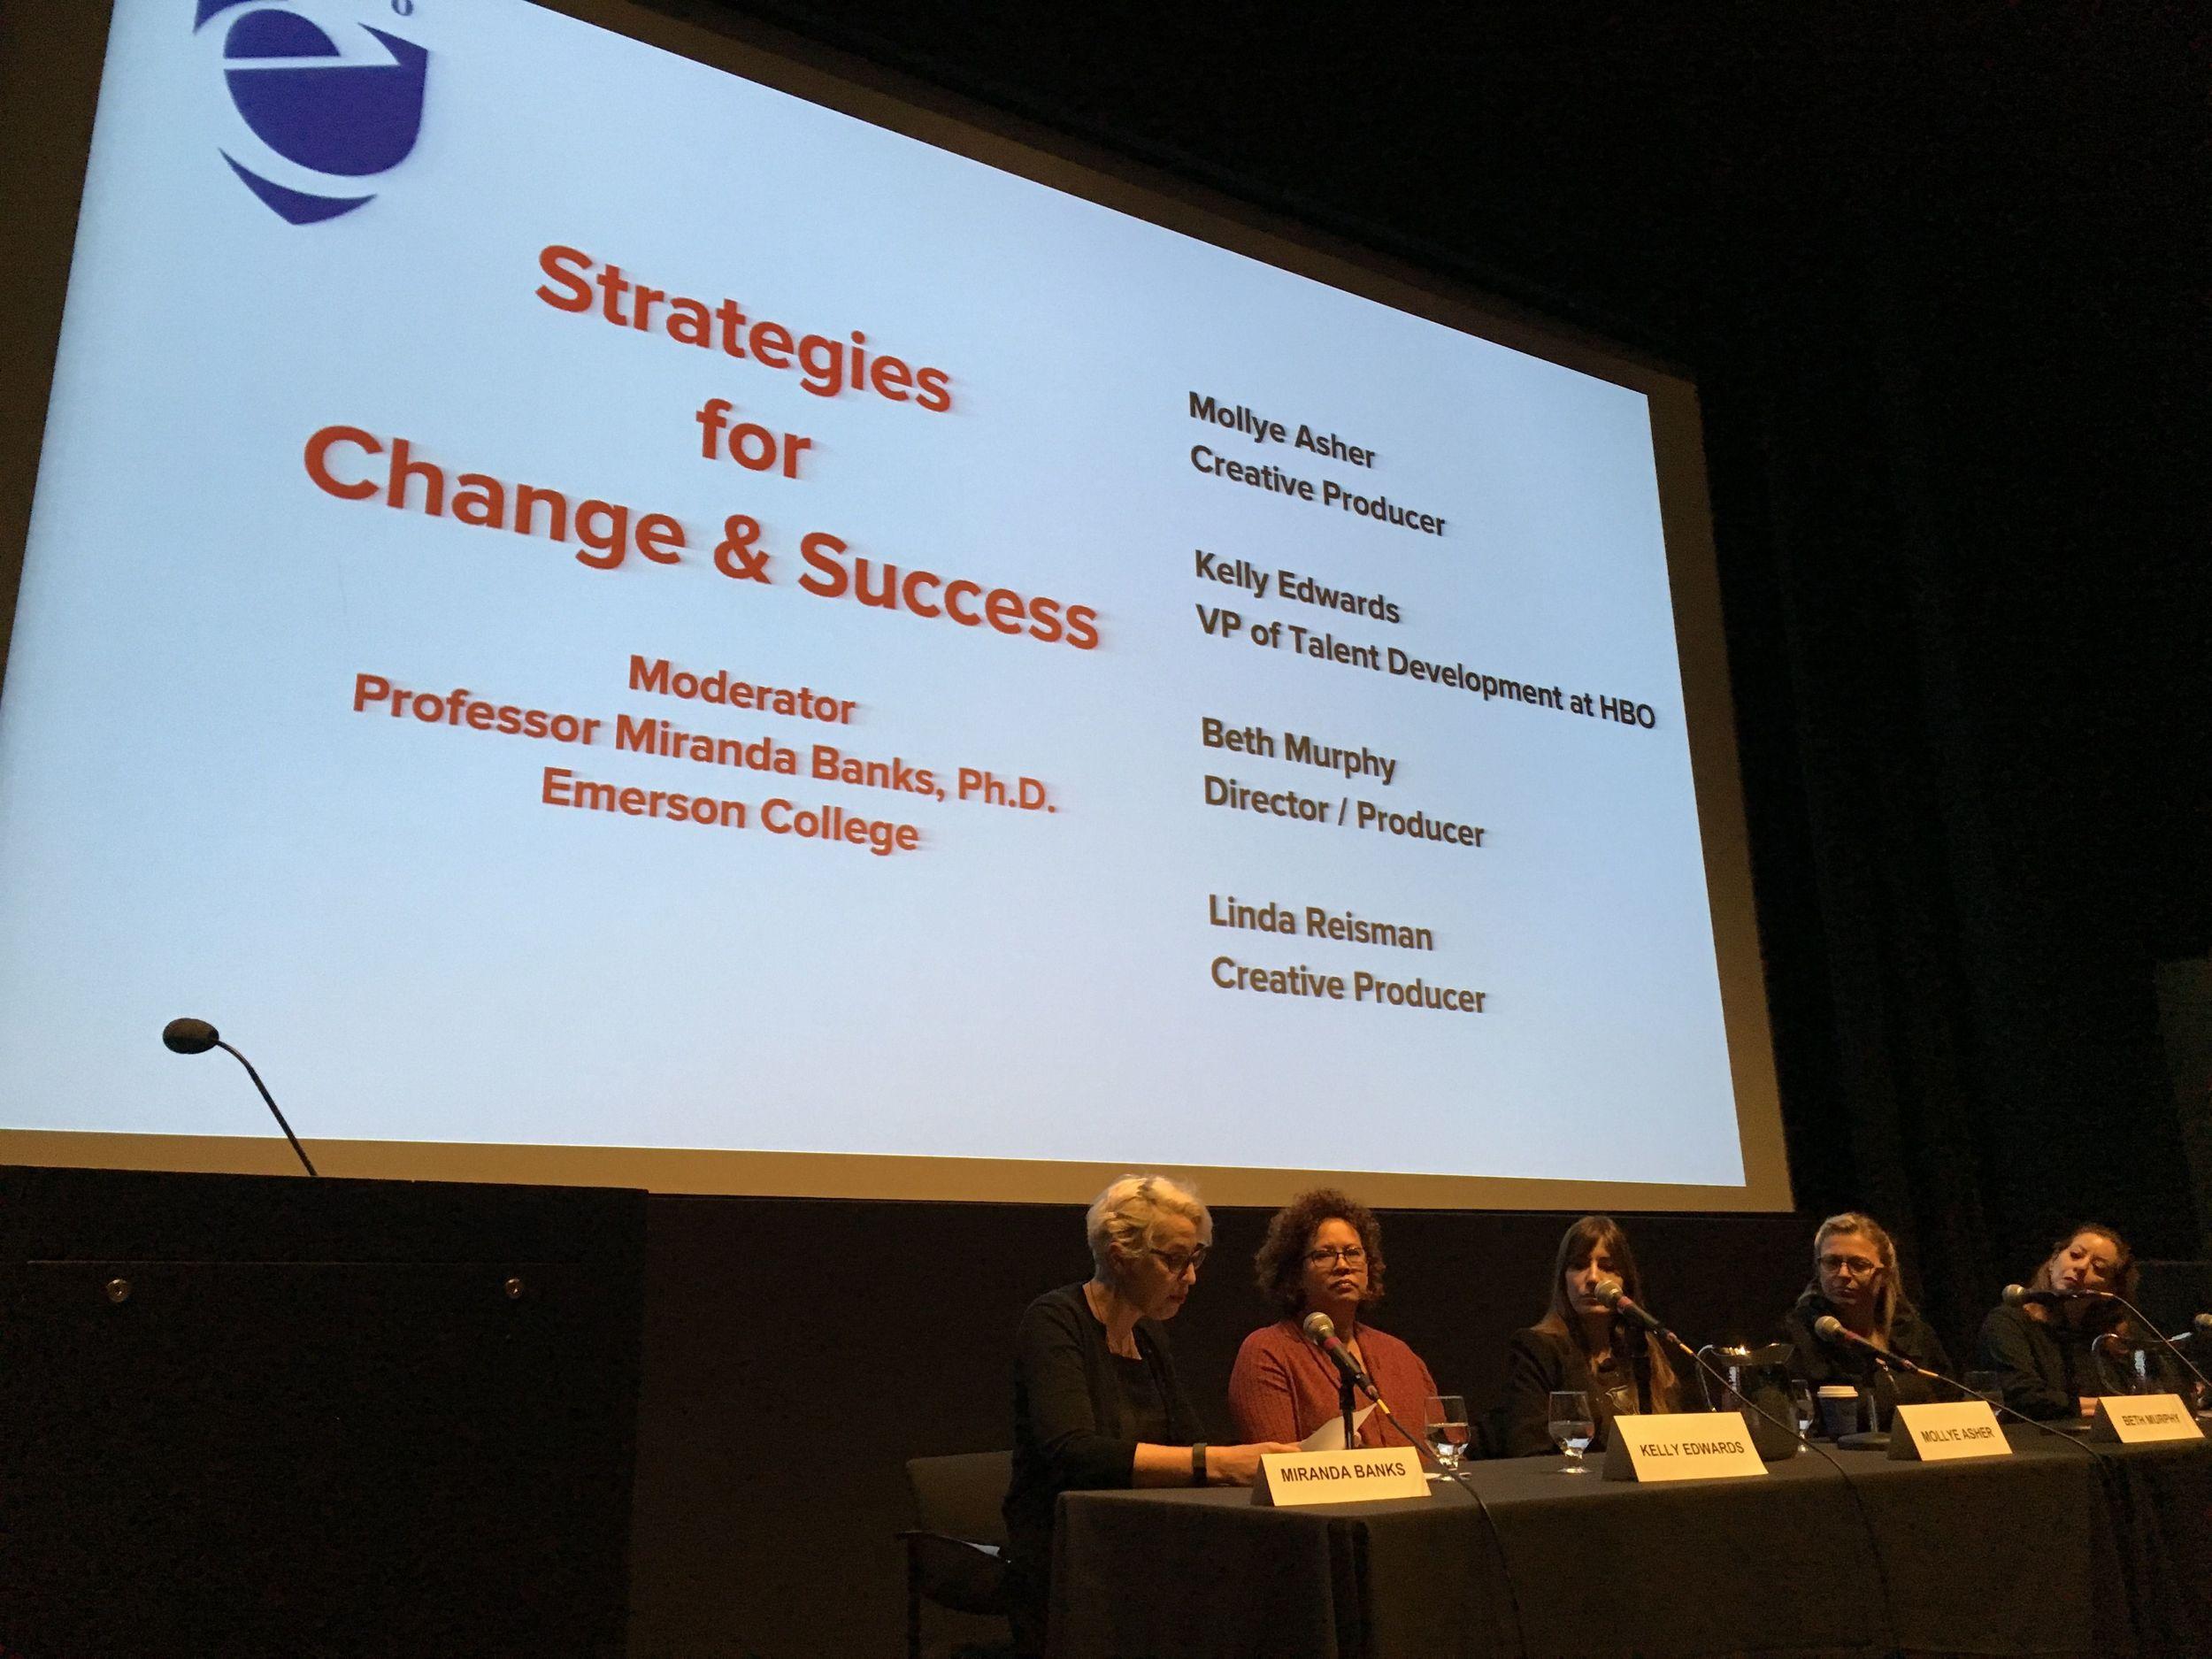 Moderator and professor, Miranda Banks; VP of talent development at HBO, Kelly Edwards; producer Mollye Asher; director/producer Beth Murphy and producer Linda Reisman.